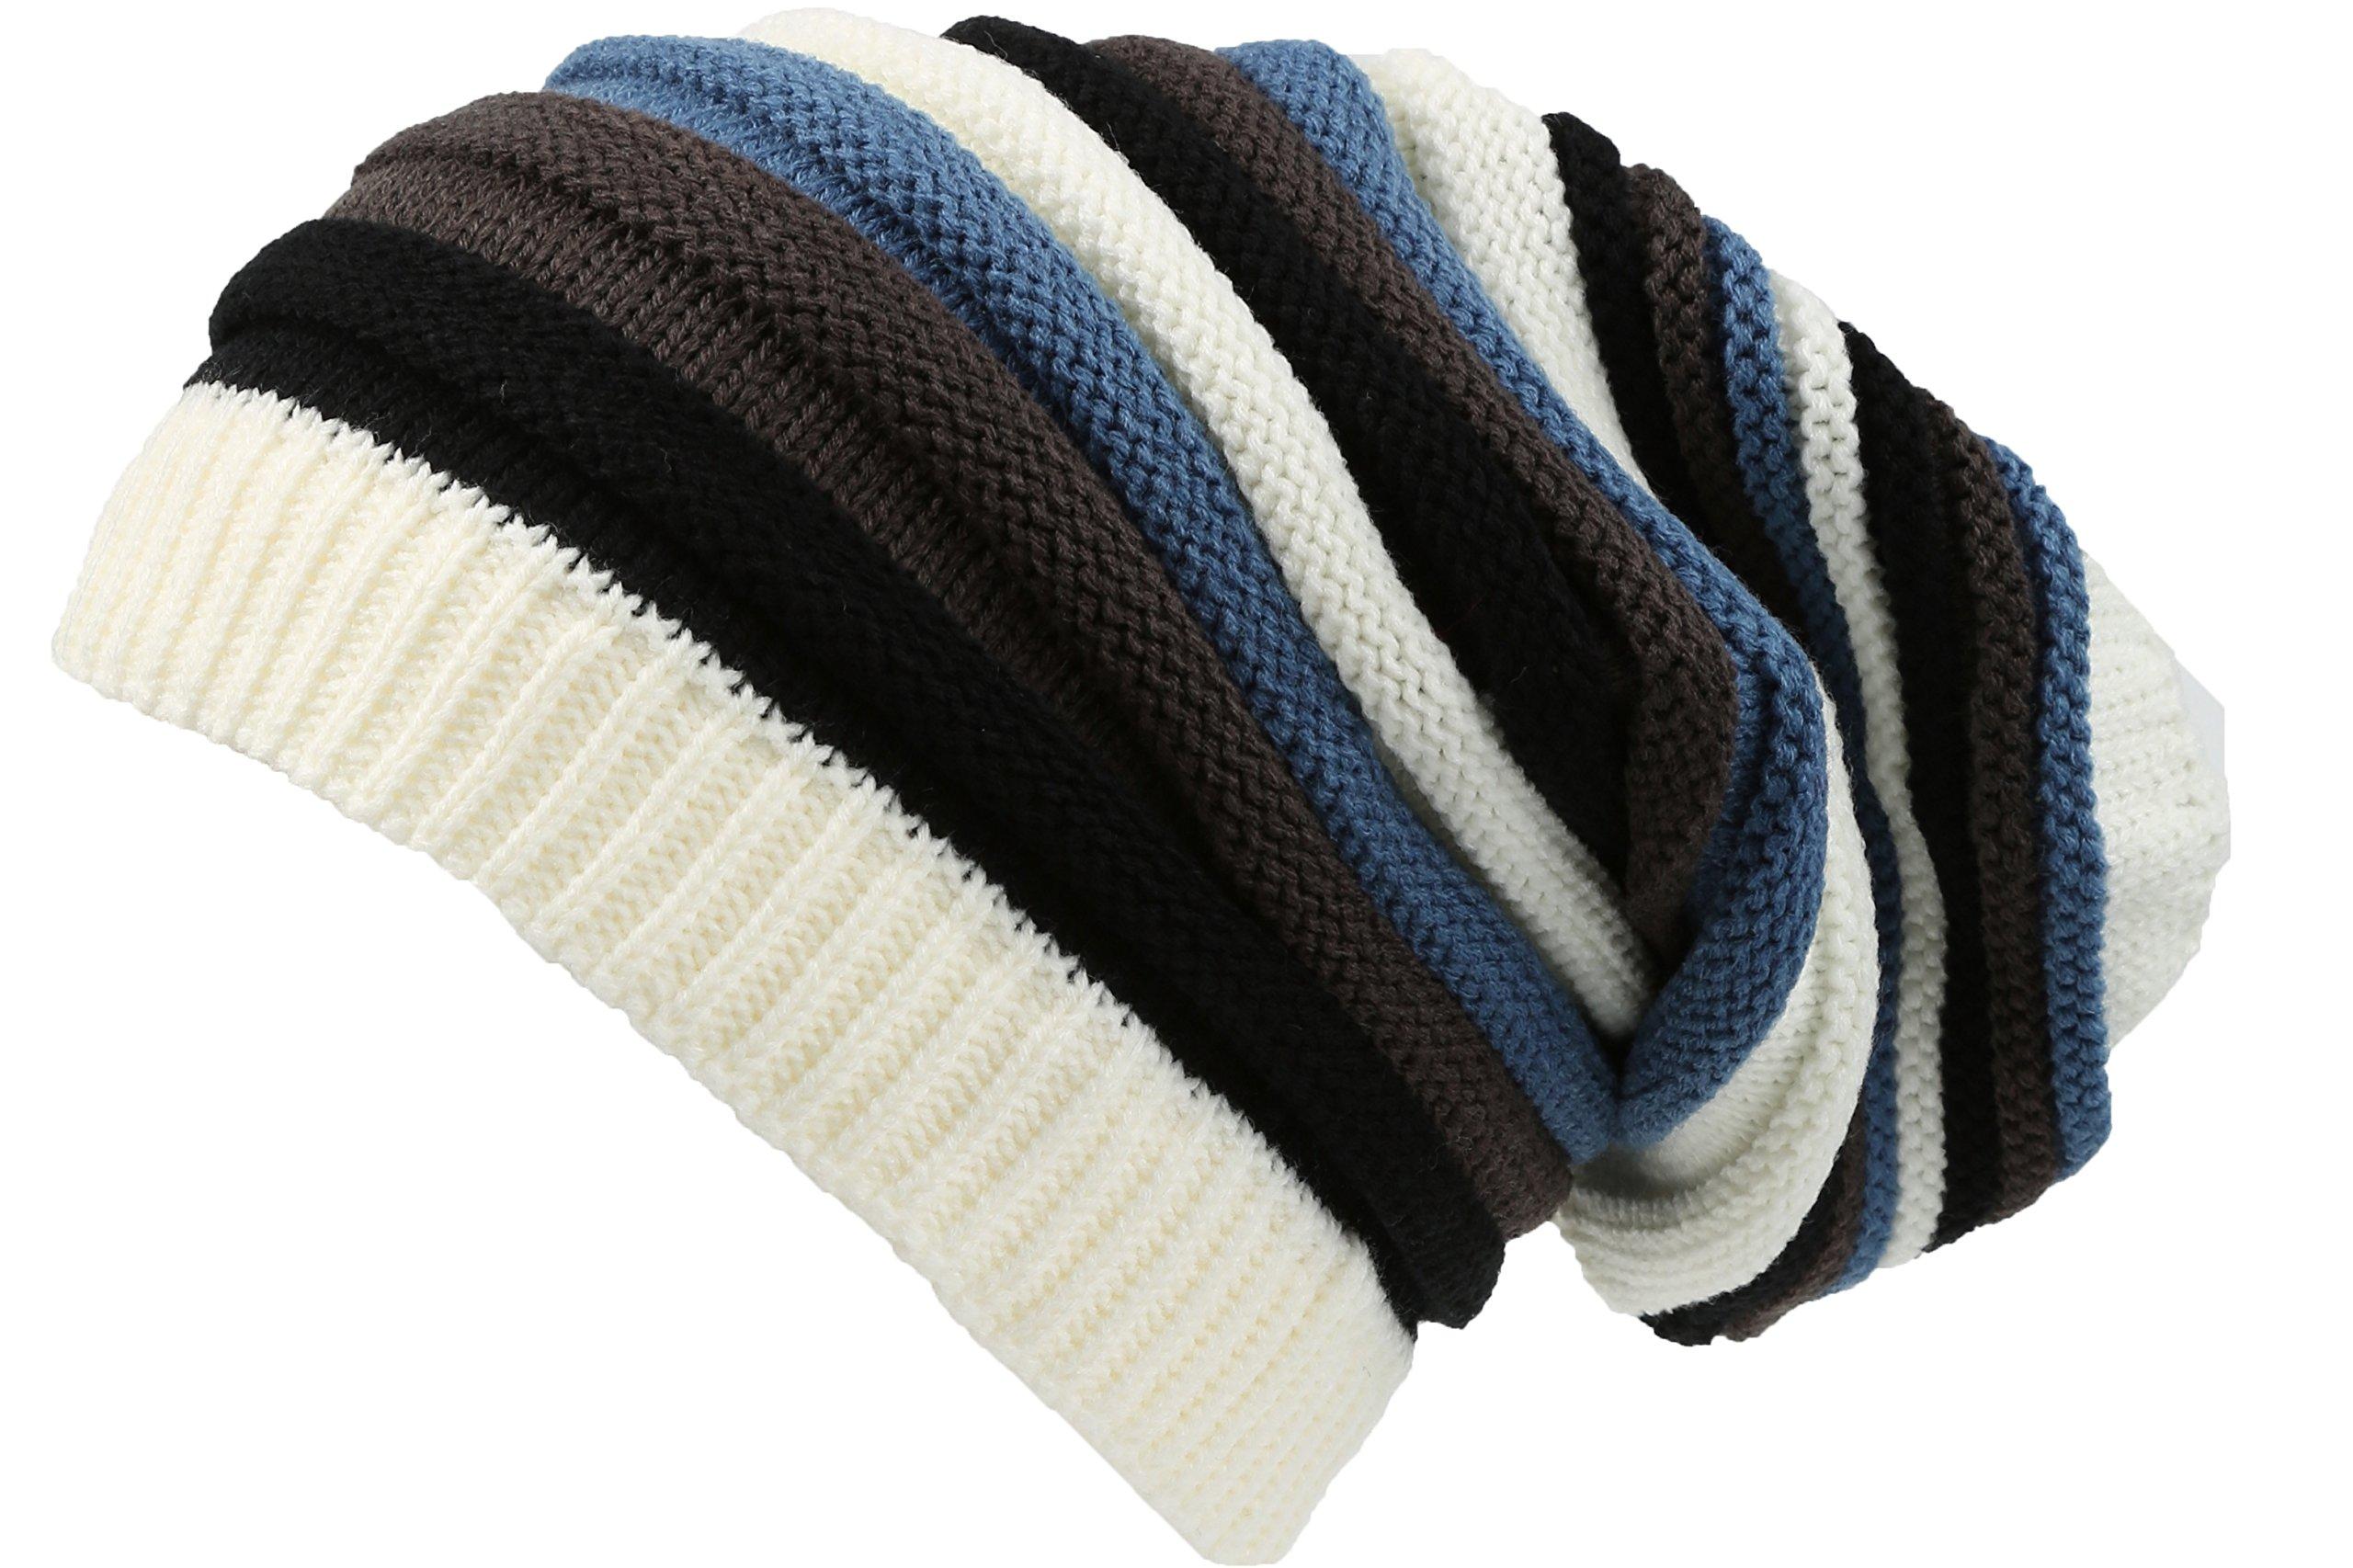 Sakkas 16144 - Ceelo Long Tall Slouchy Unisex Striped Ribbed Kint Adjustable Beanie Hat - Cream / Blue - OS